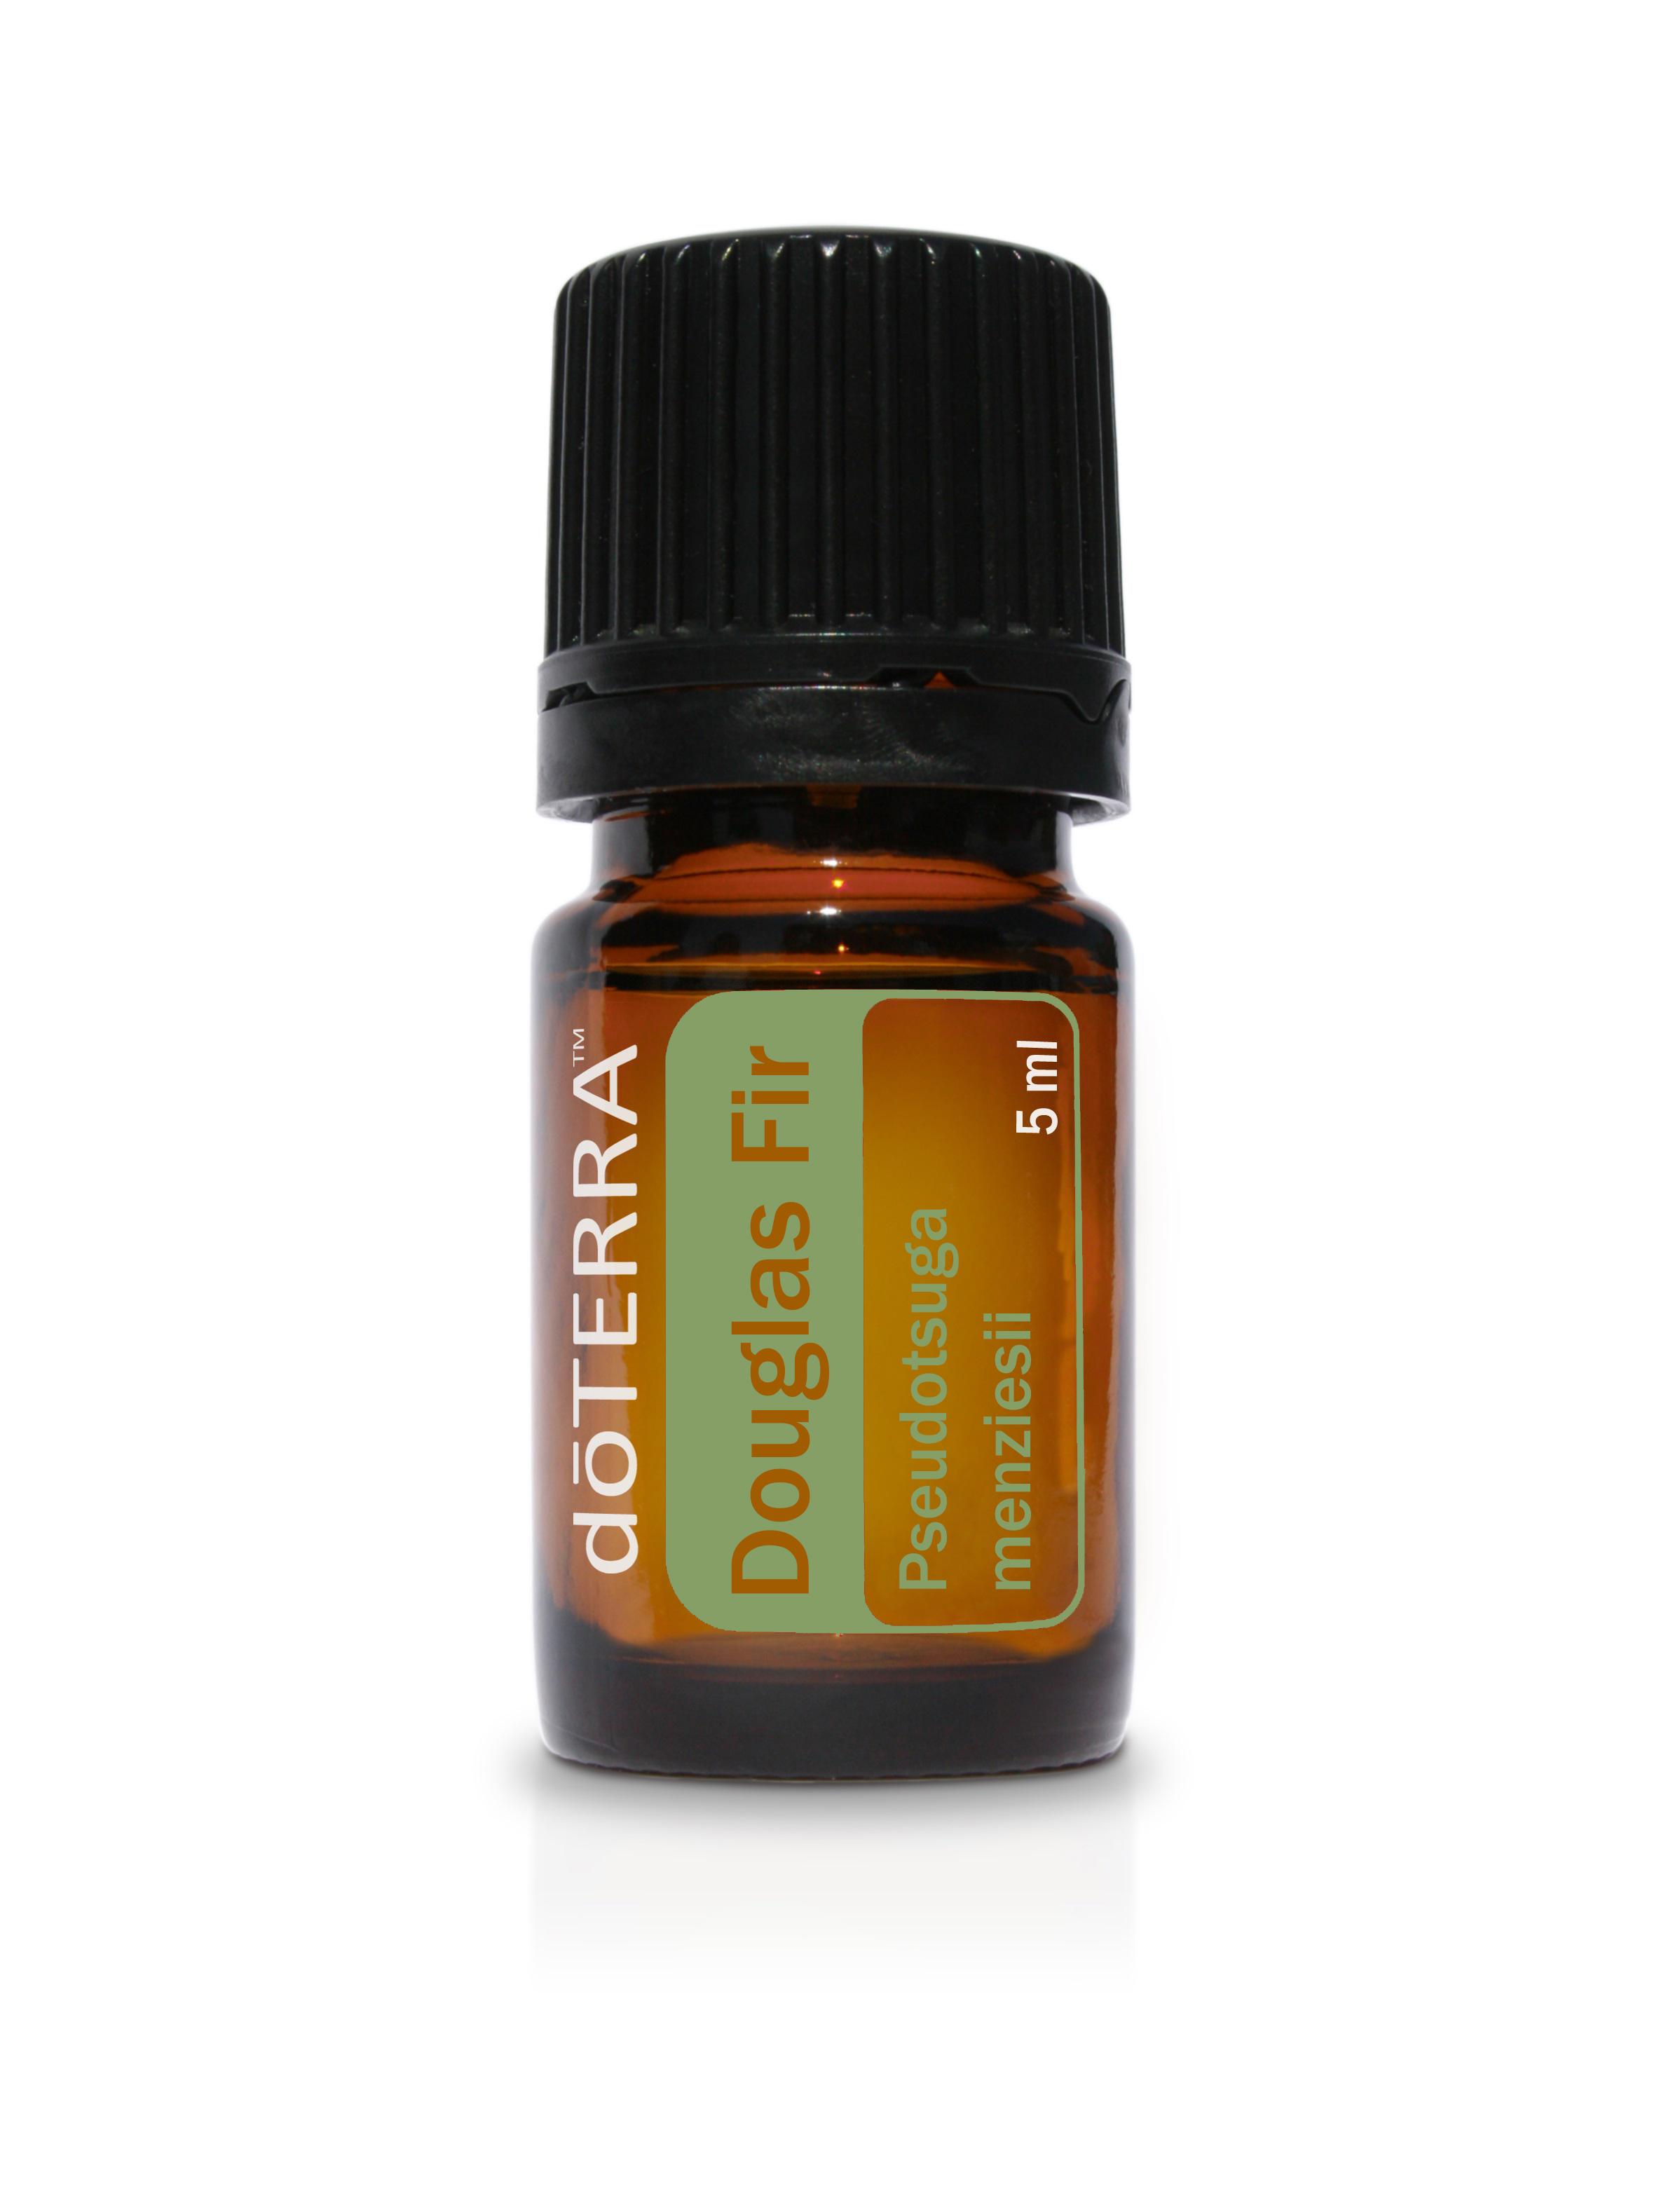 Douglas Fir Essential Oil